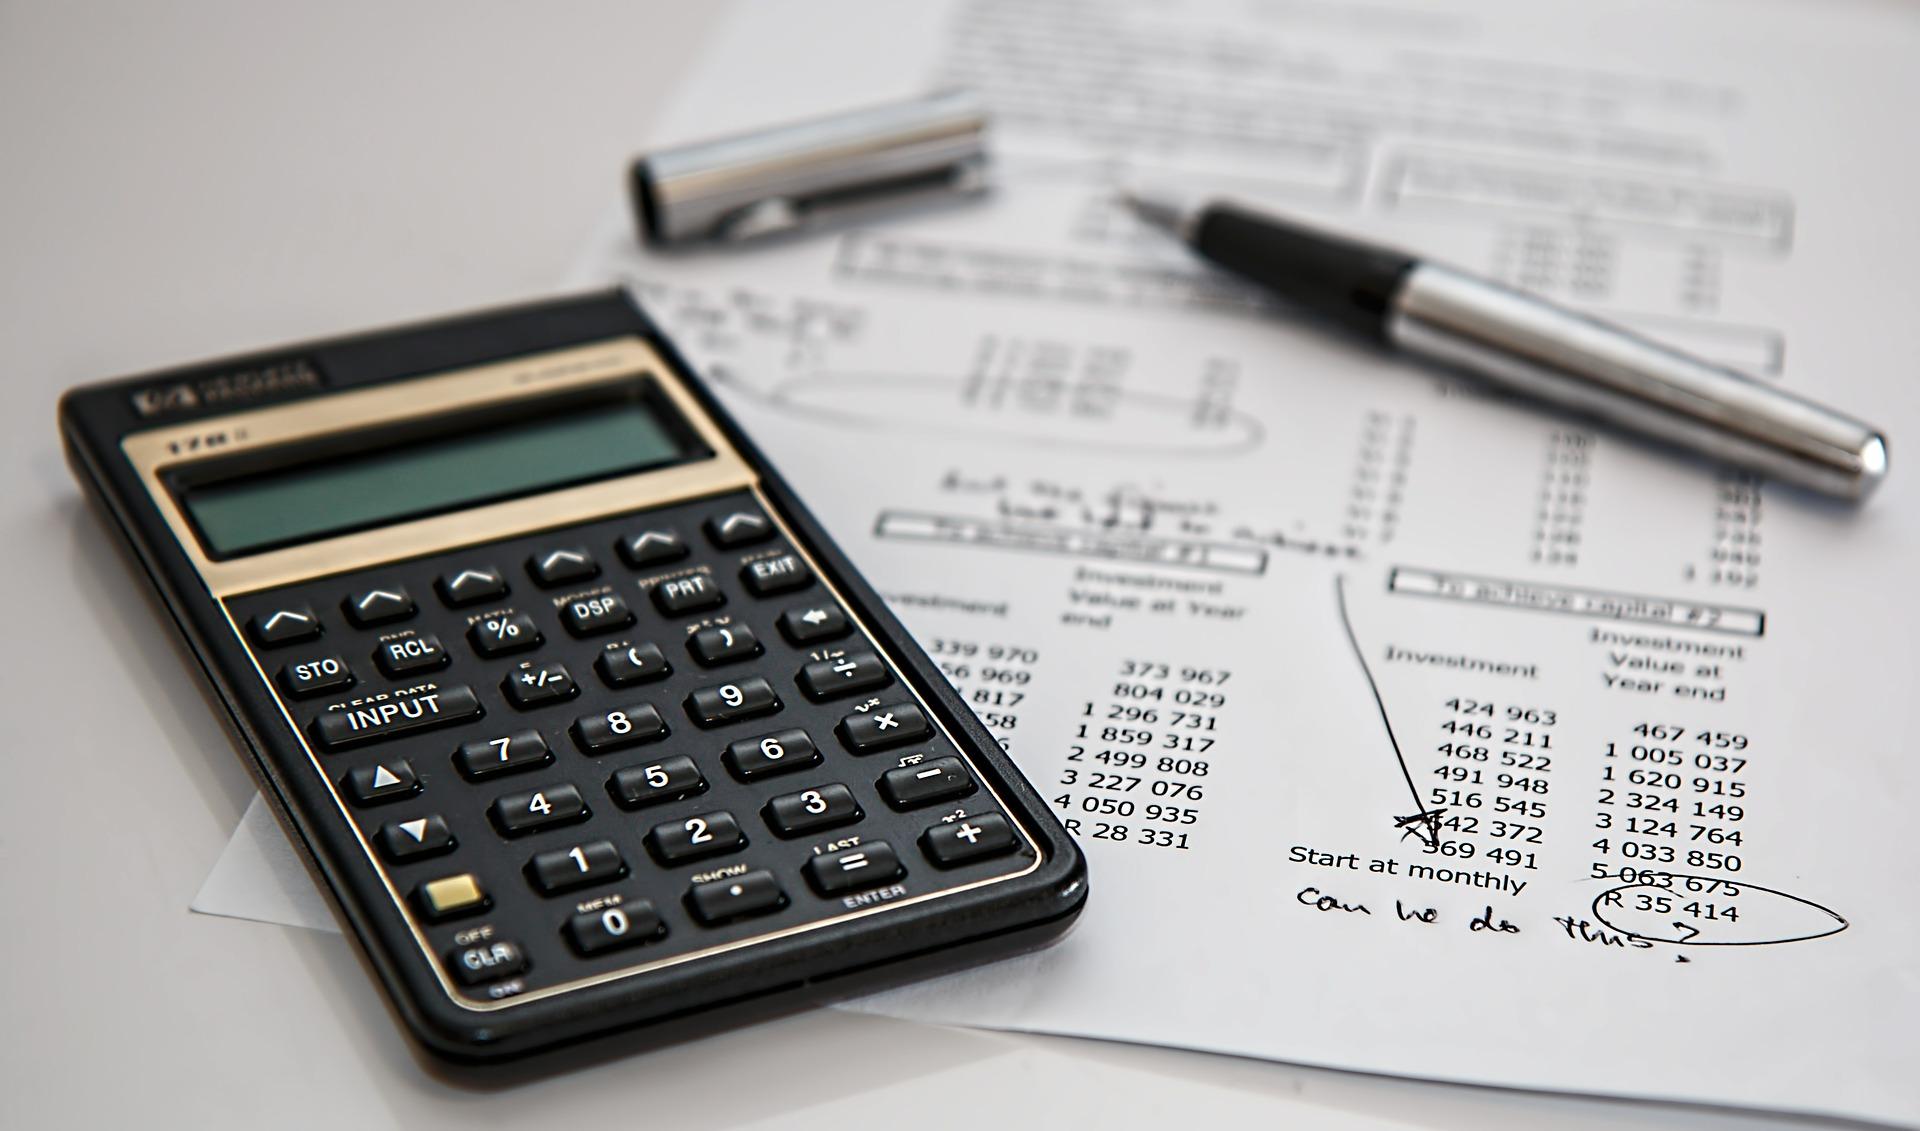 FIFO, LIFO and WAC accounting methods